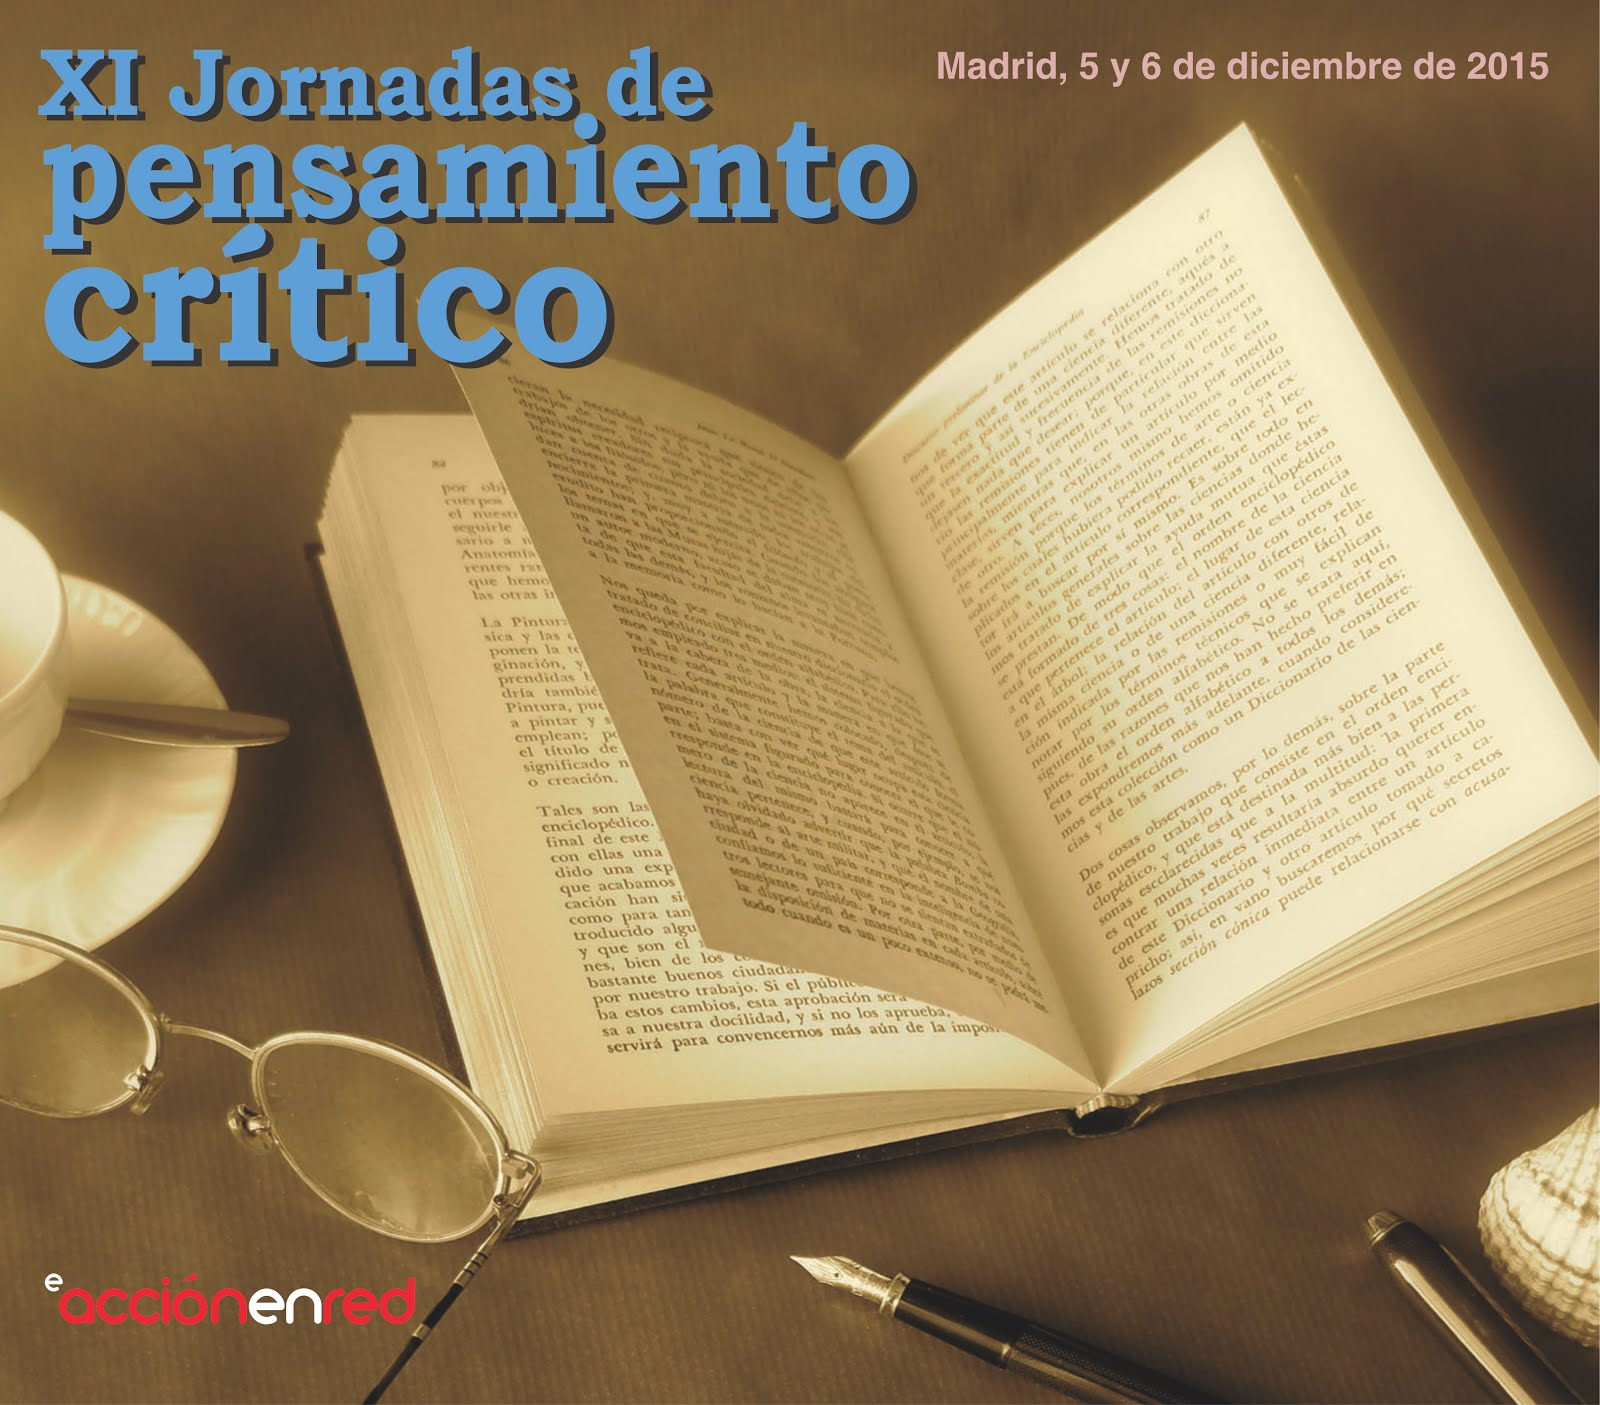 XI JORNADAS DE PENSAMIENTO CRÍTICO